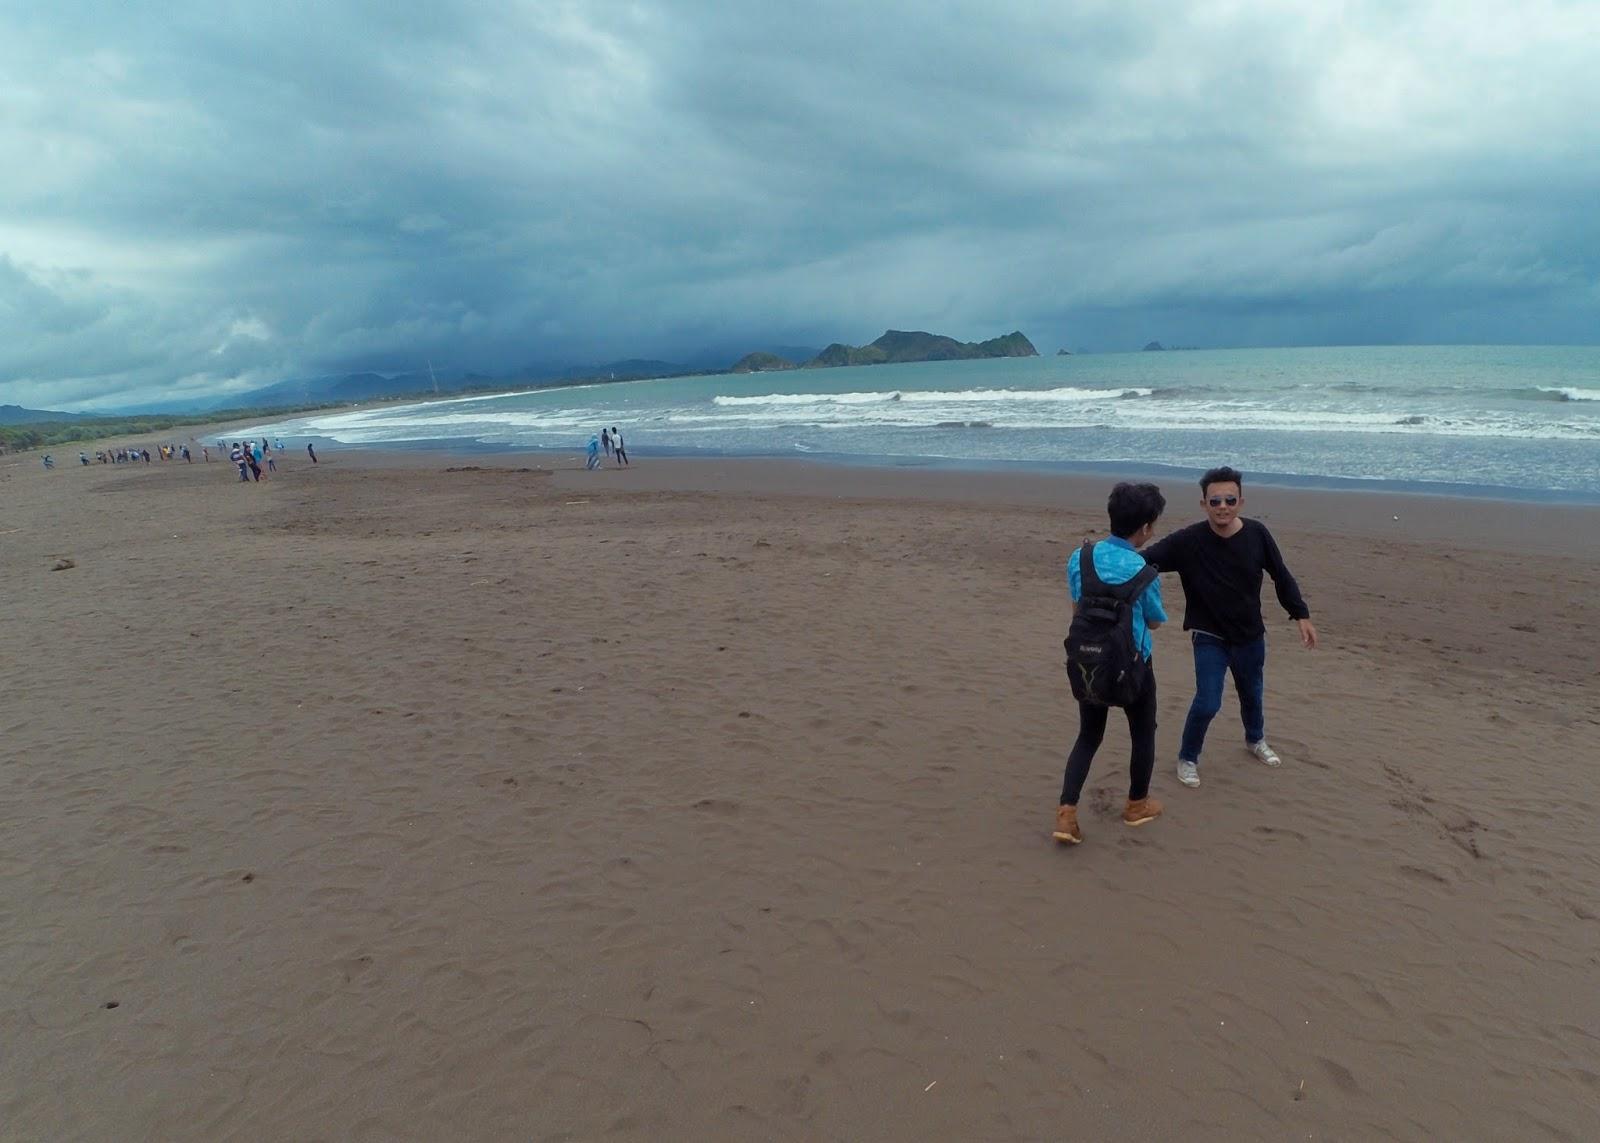 Menikmati Debur Ombak Mitos Mistis Pantai Watu Ulo Objek Wisata